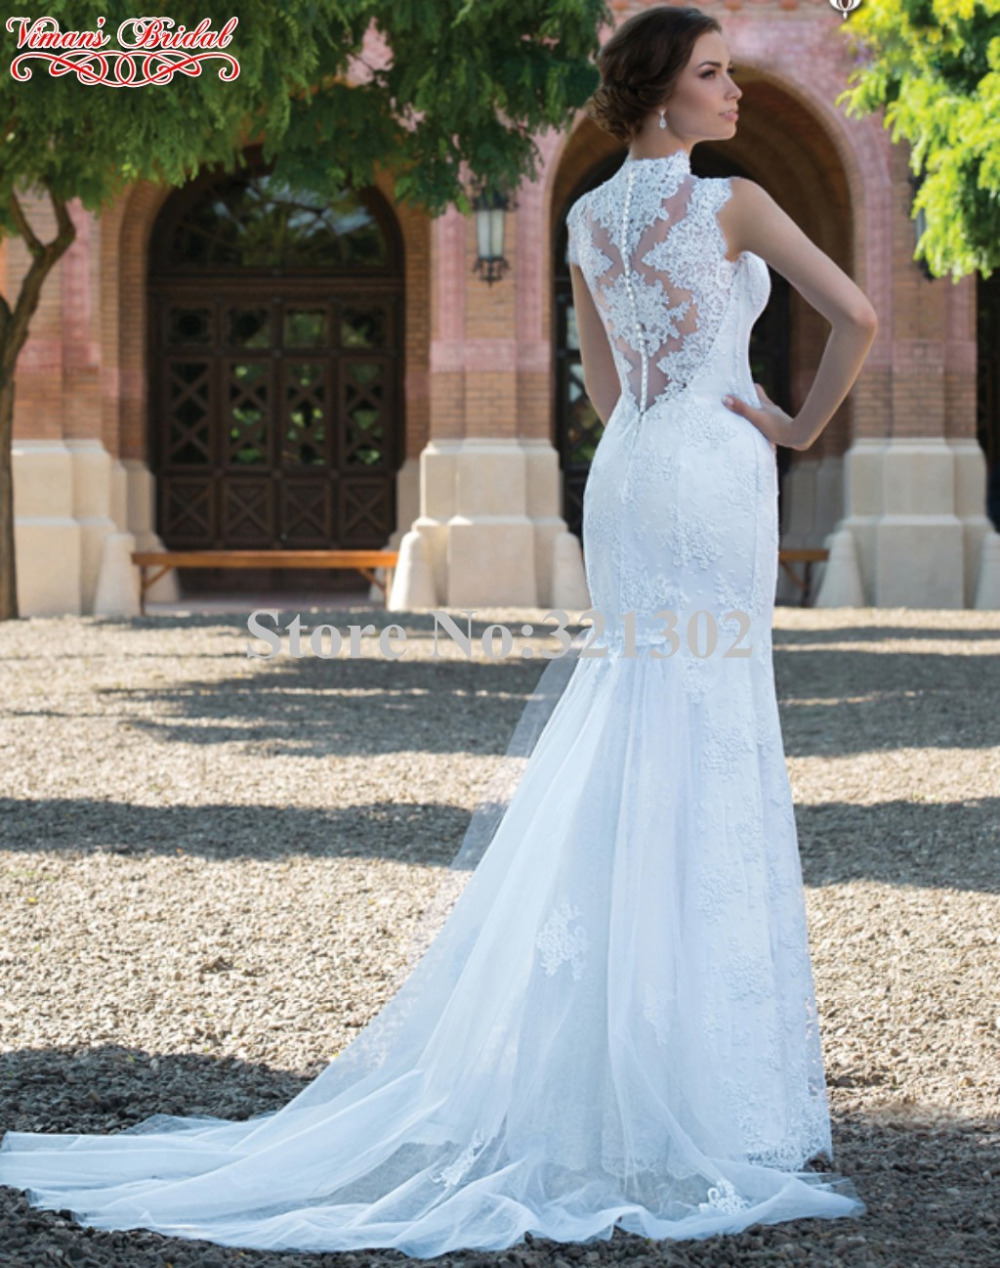 0ea9256ab6a2a 2017 New Design Vintage Wedding Dress Liques Lace High Neck